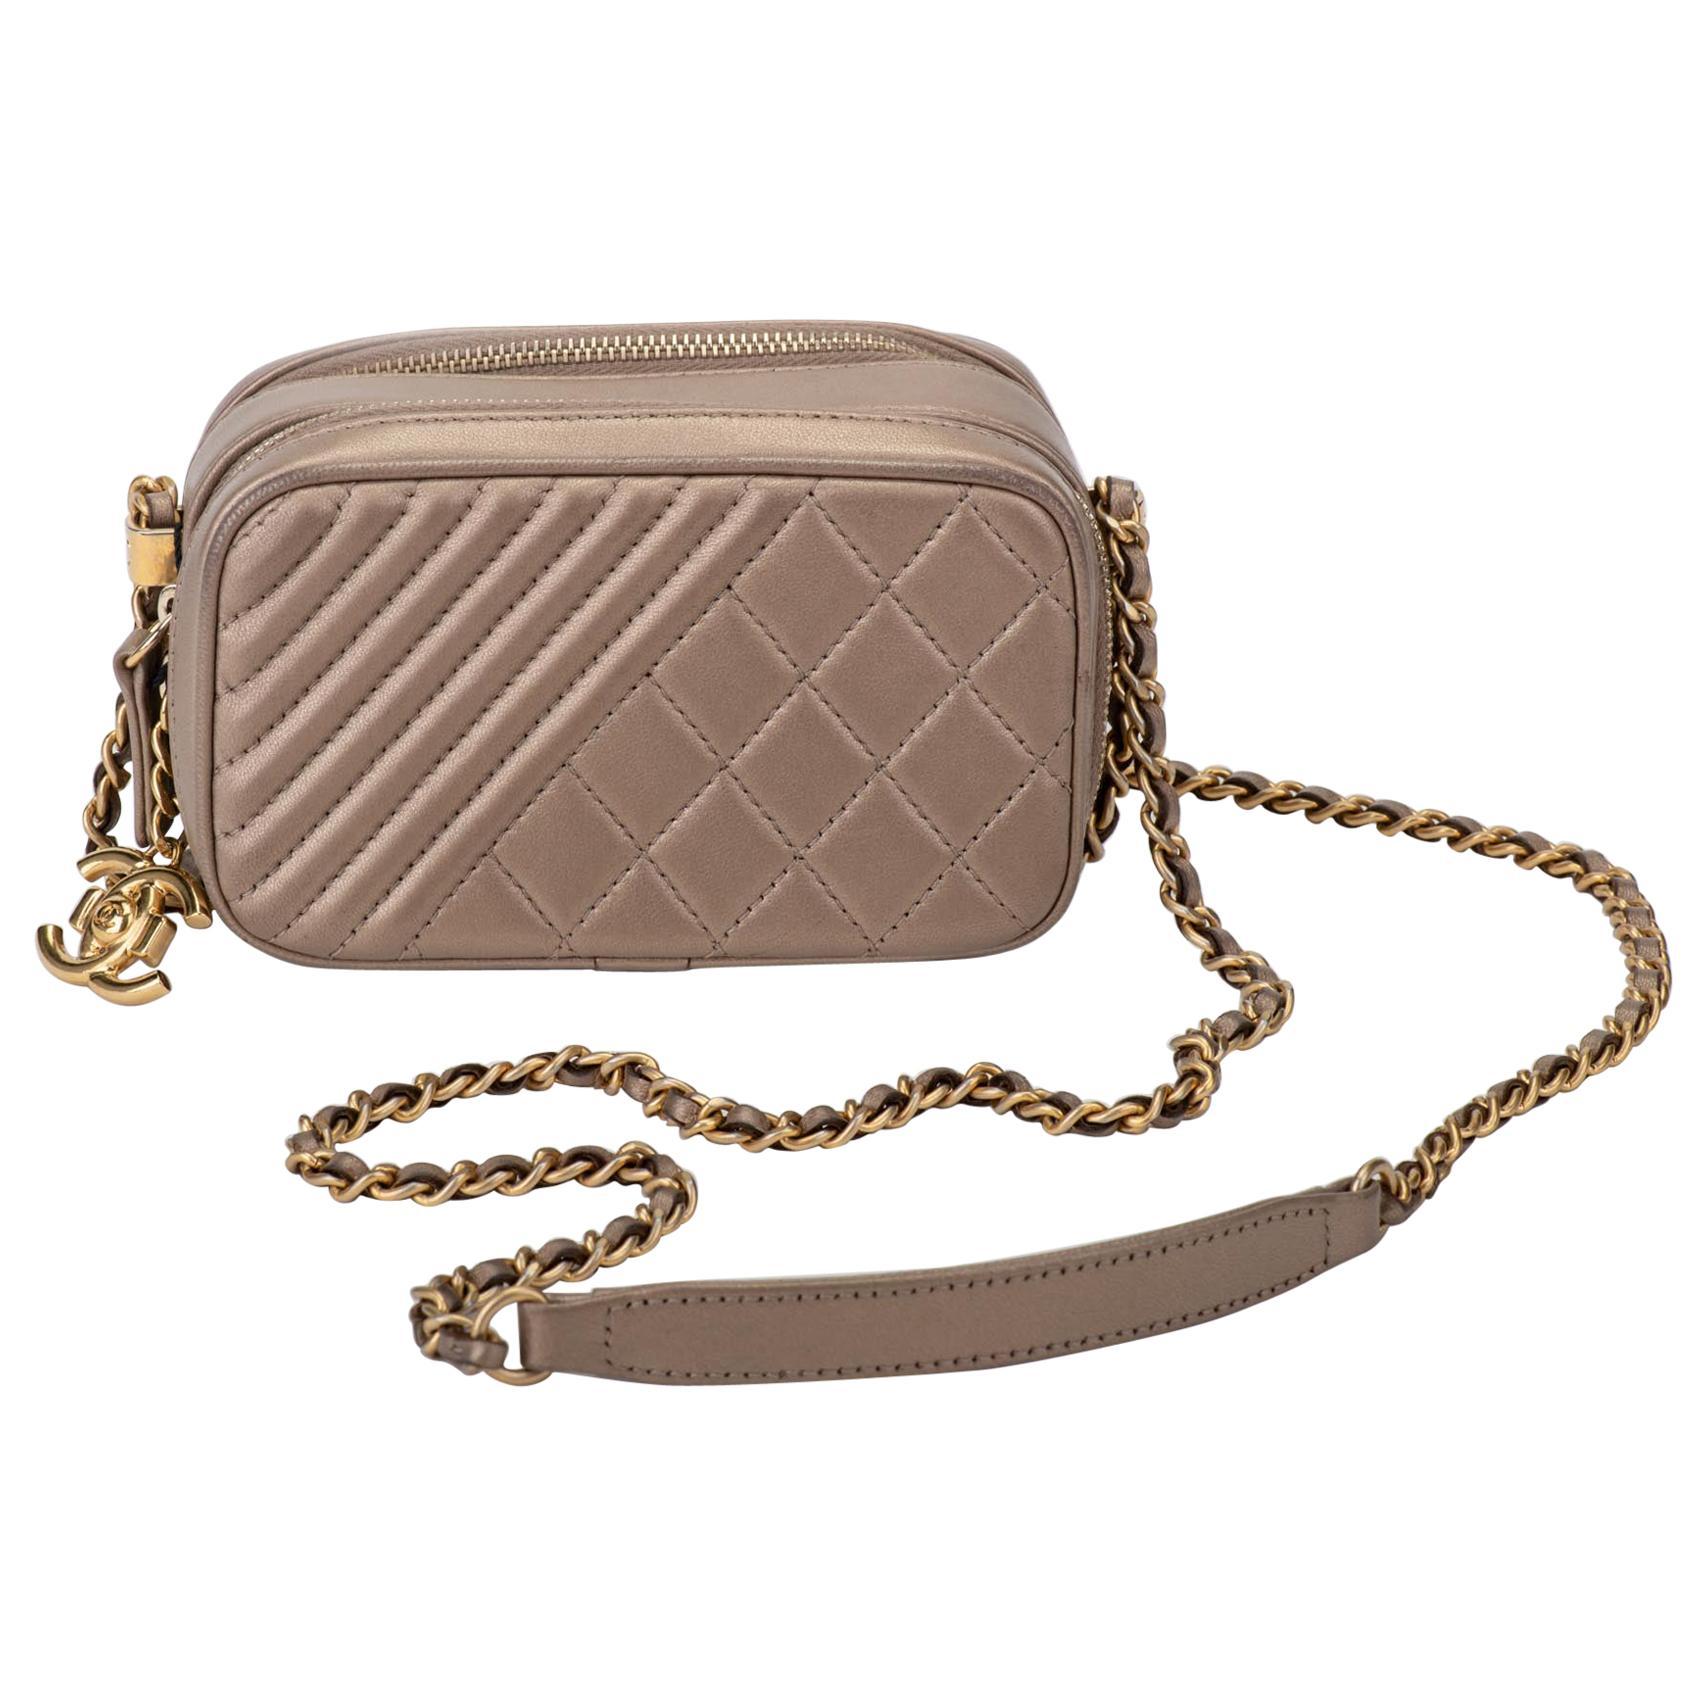 Chanel Bronze Soleil Crossbody Bag